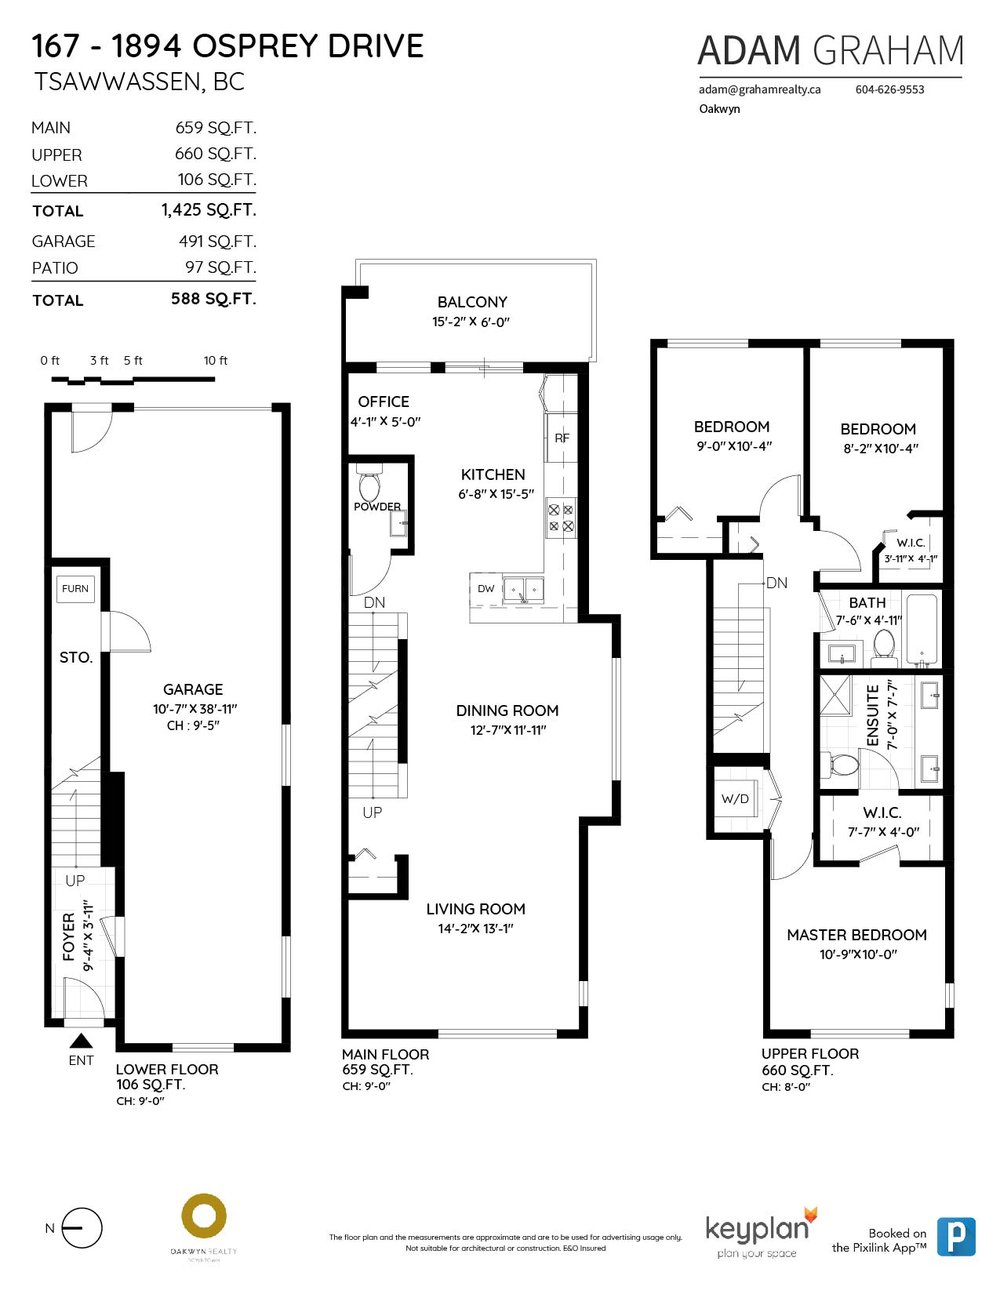 Floor Plan for a 3 Bedroom Townhouse in